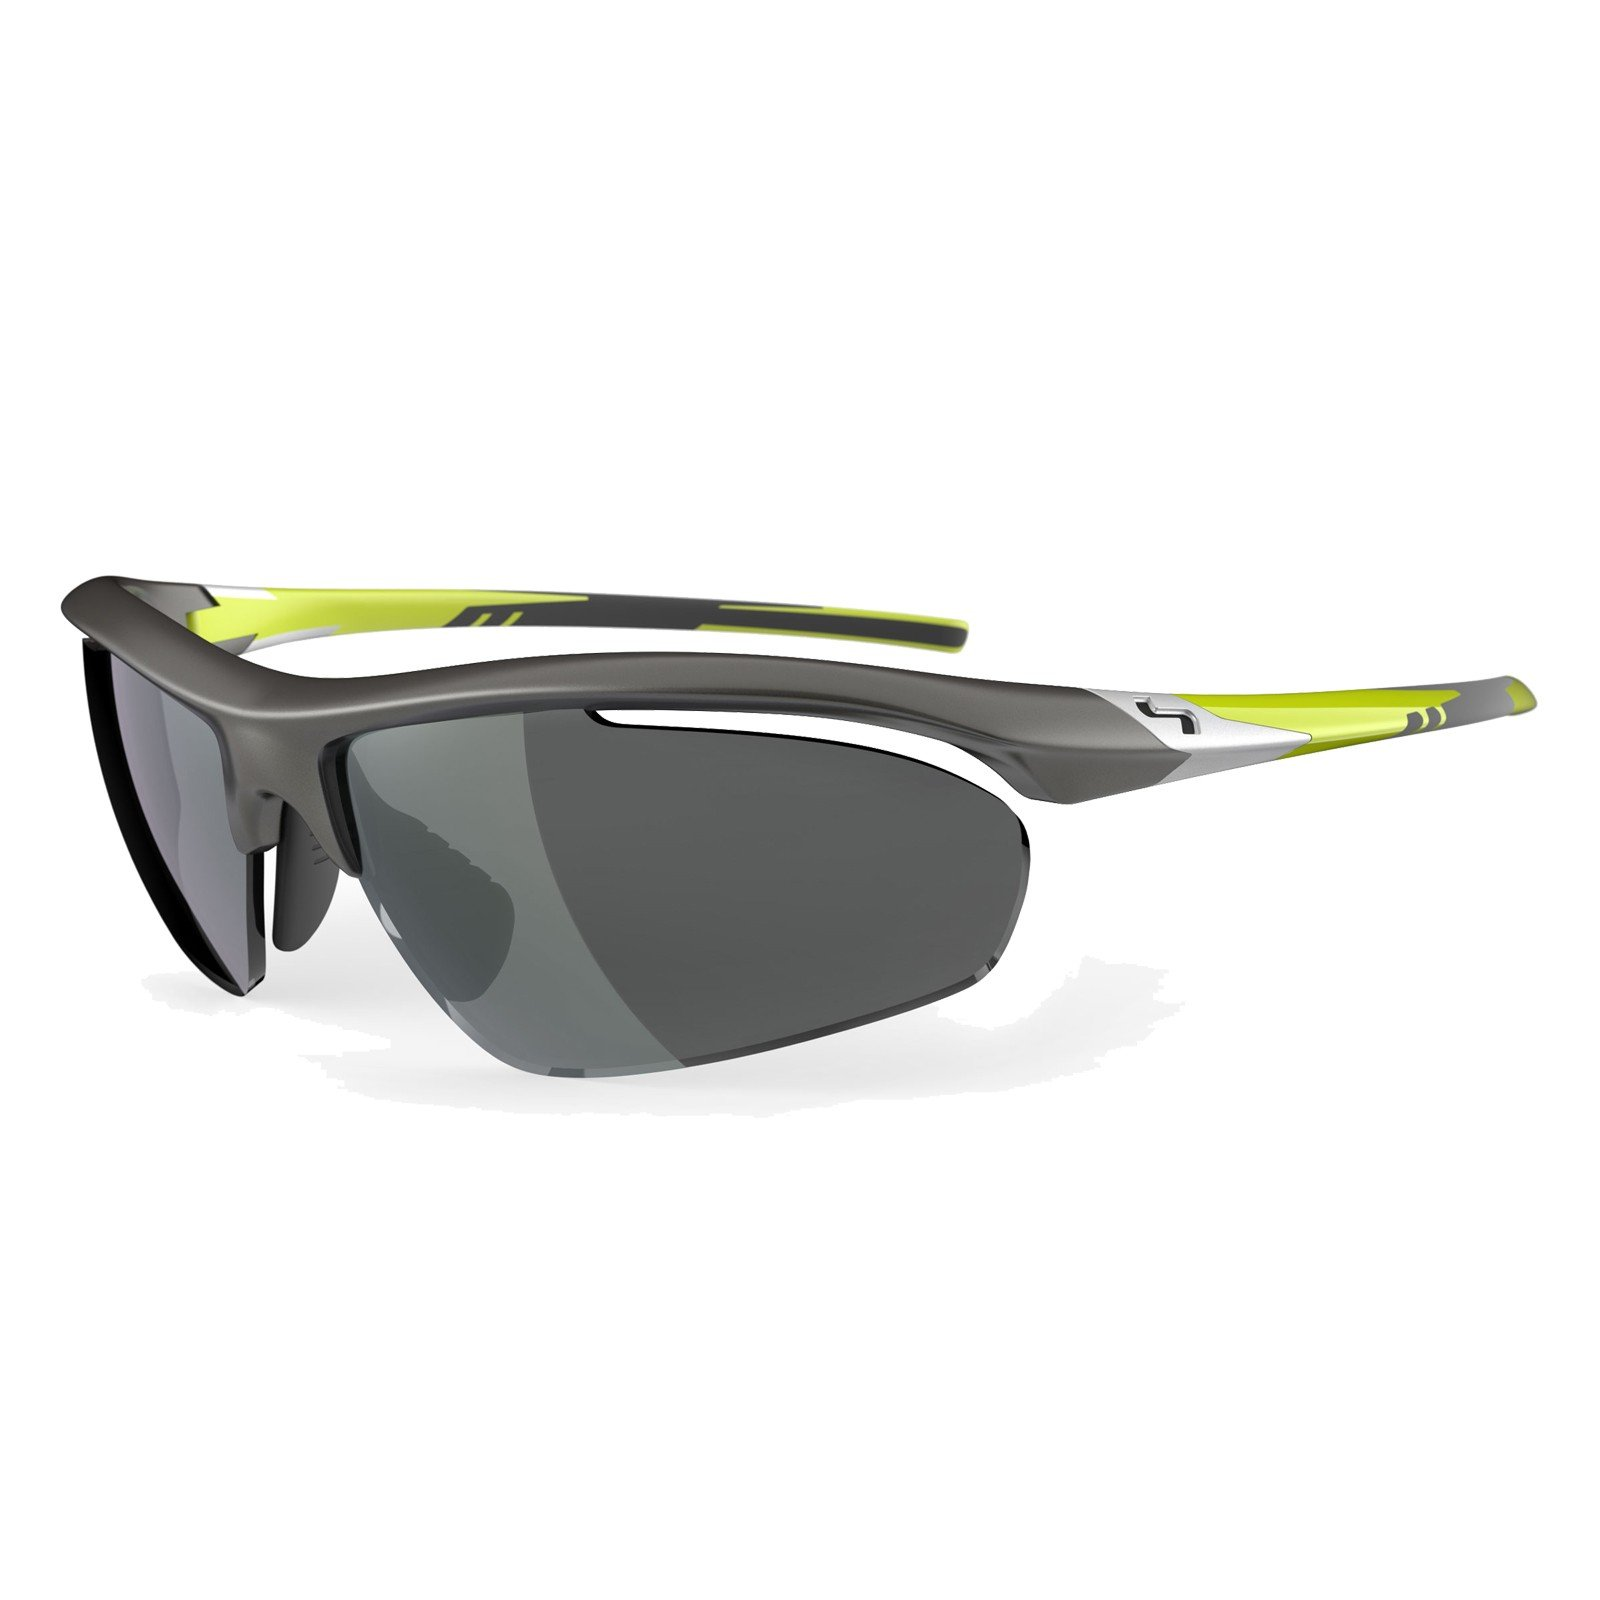 Sundog Golf Sunglasses